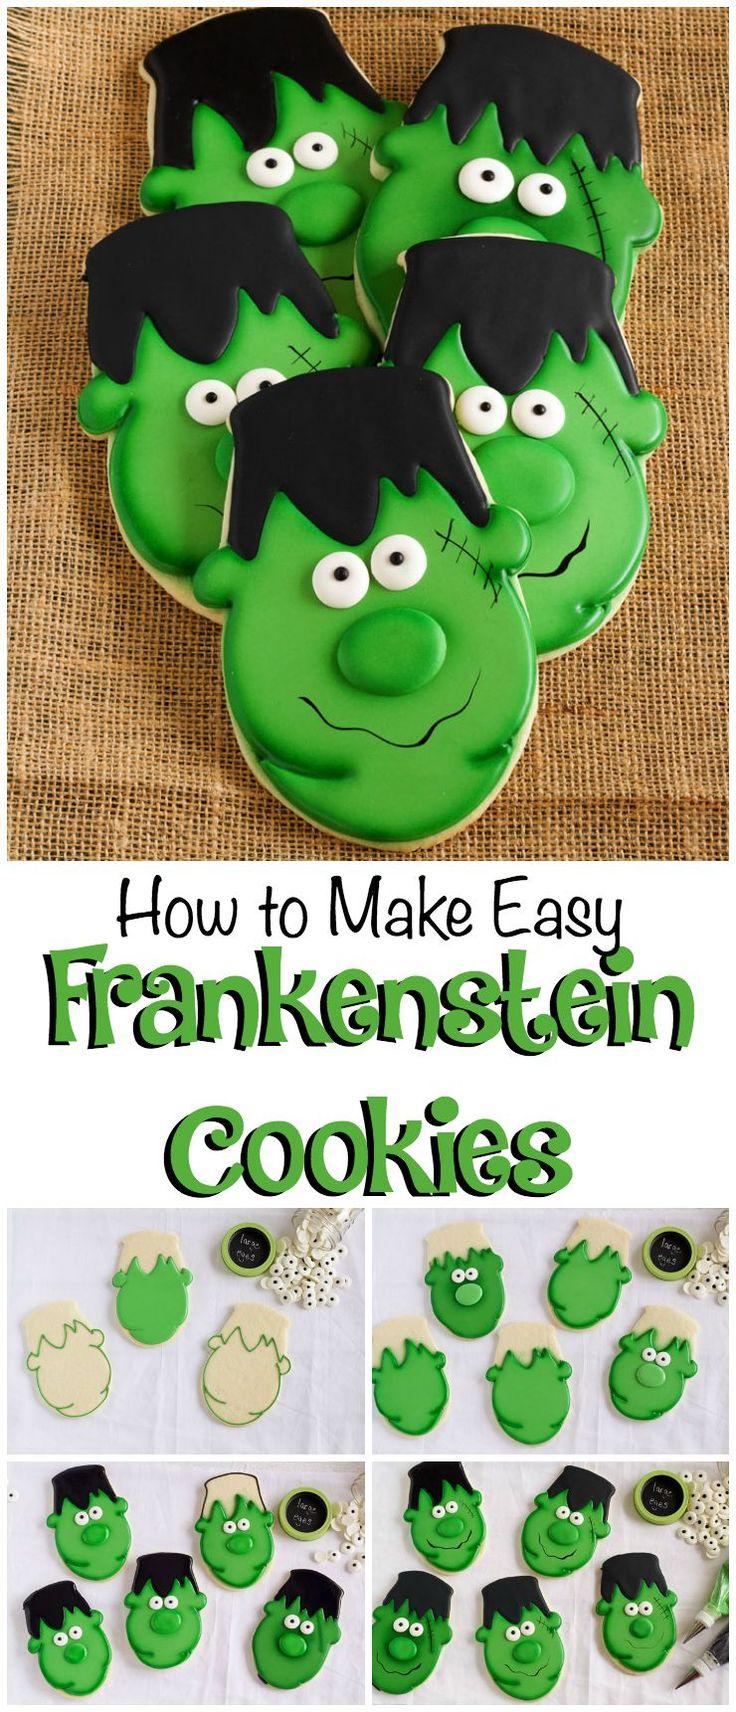 How to Make Easy Frankenstein Cookies via www.thebearfootbaker.com